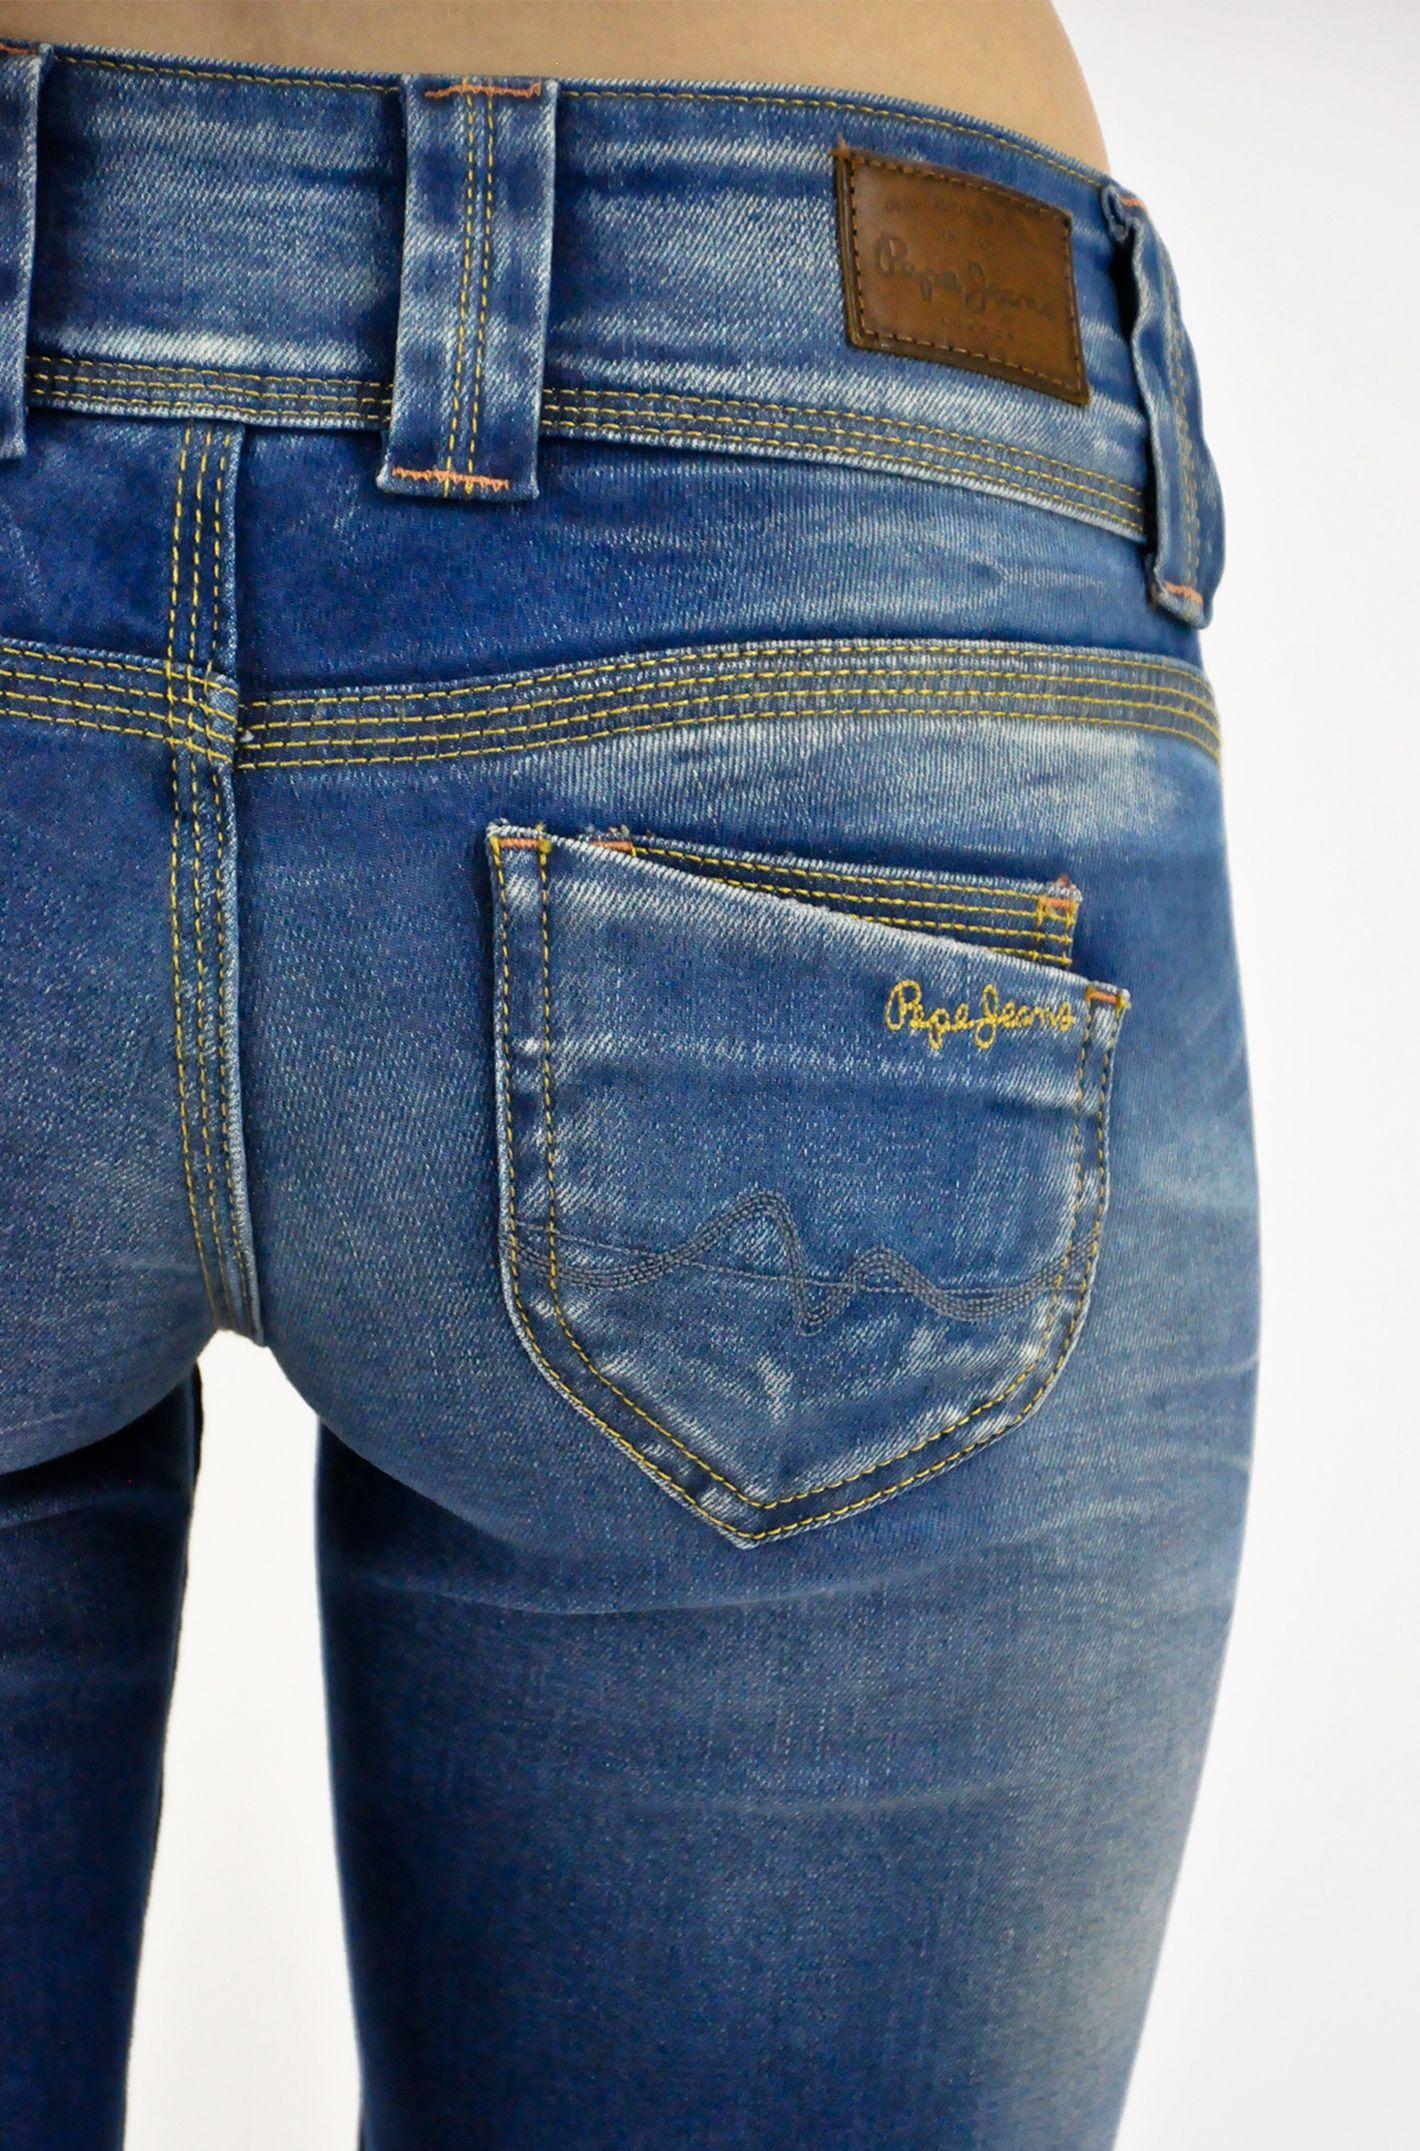 379118dabde Spodnie jeansowe damskie Pepe Jeans model Venus S23